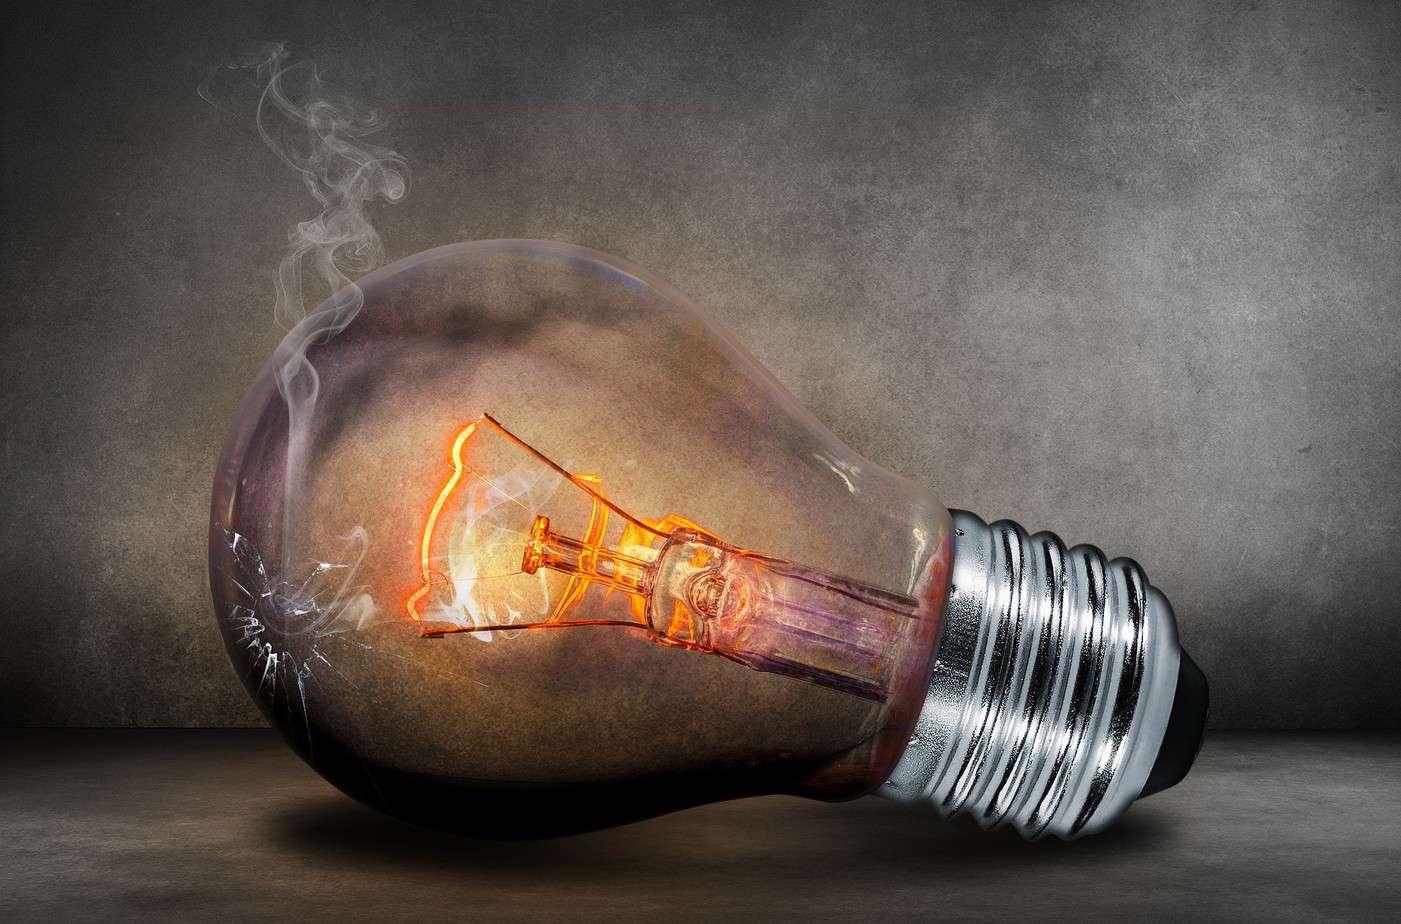 UK energy price rises